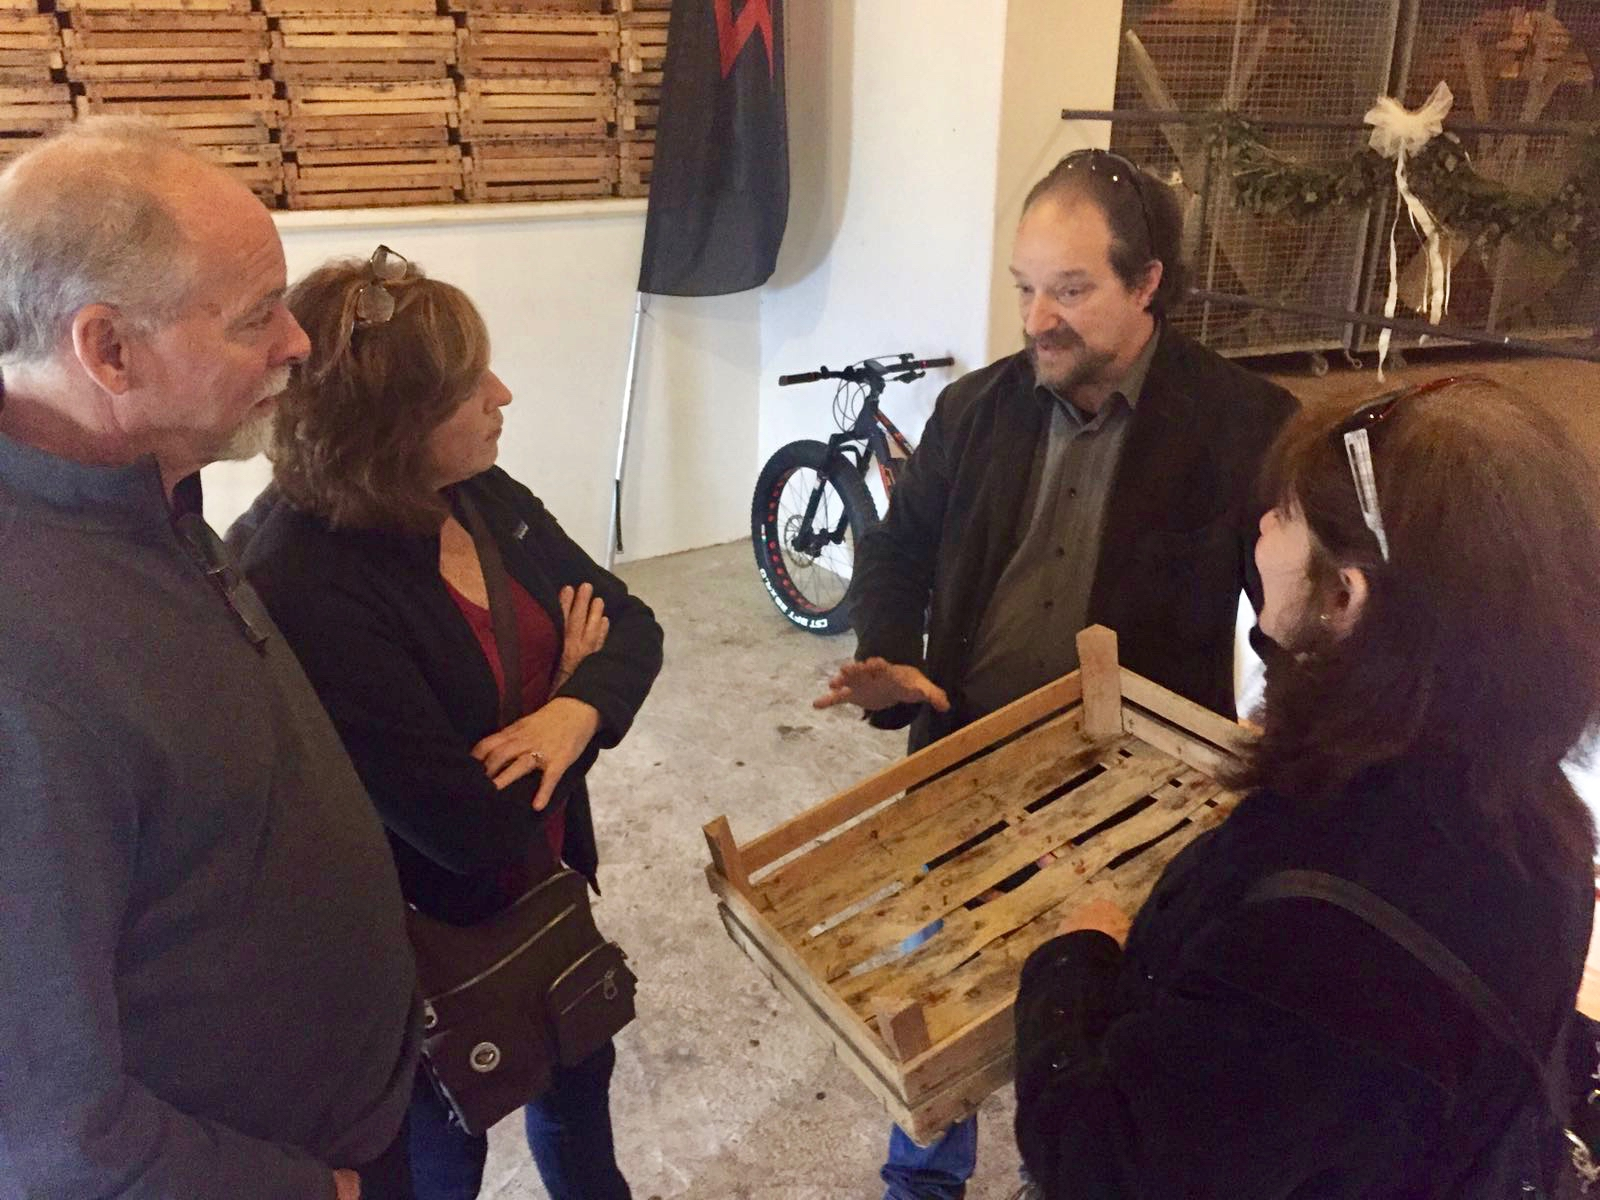 Introducing the appassimento in small wooden boxes - photo courtesy of tenuta santa maria valverde